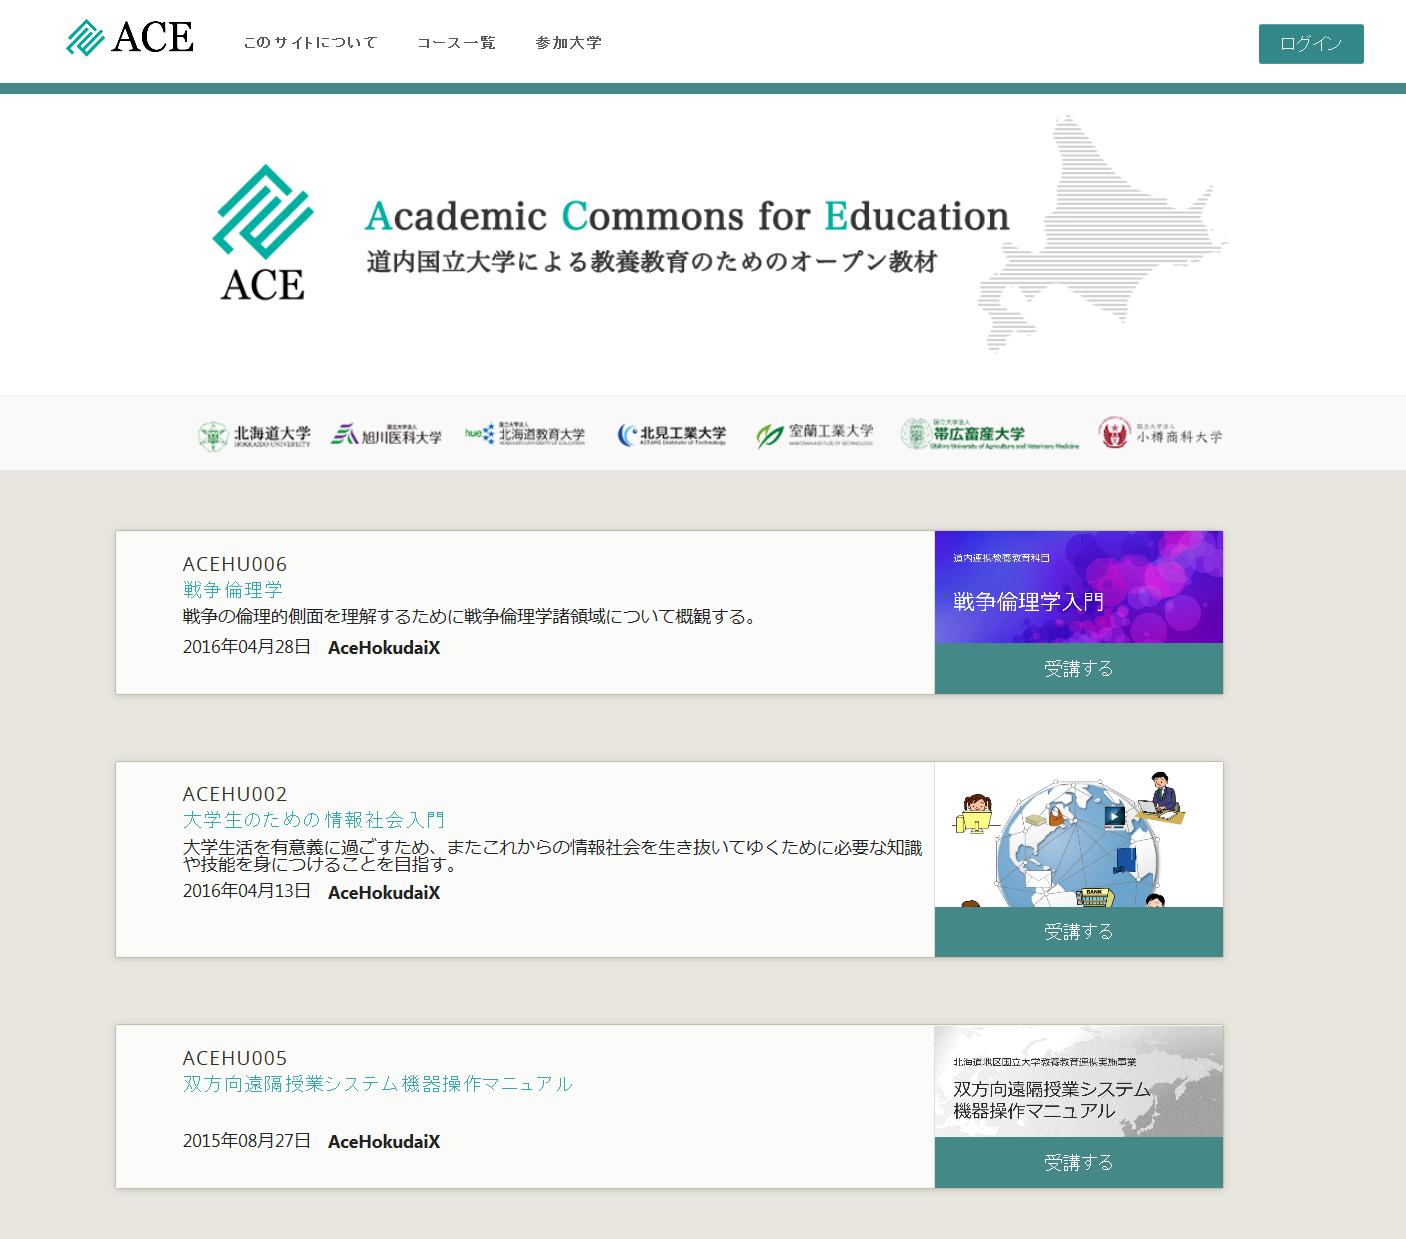 Academic Commons for Education 道内国立大学による教養教育のためのオープン教材 のサイトのスクリーンショット